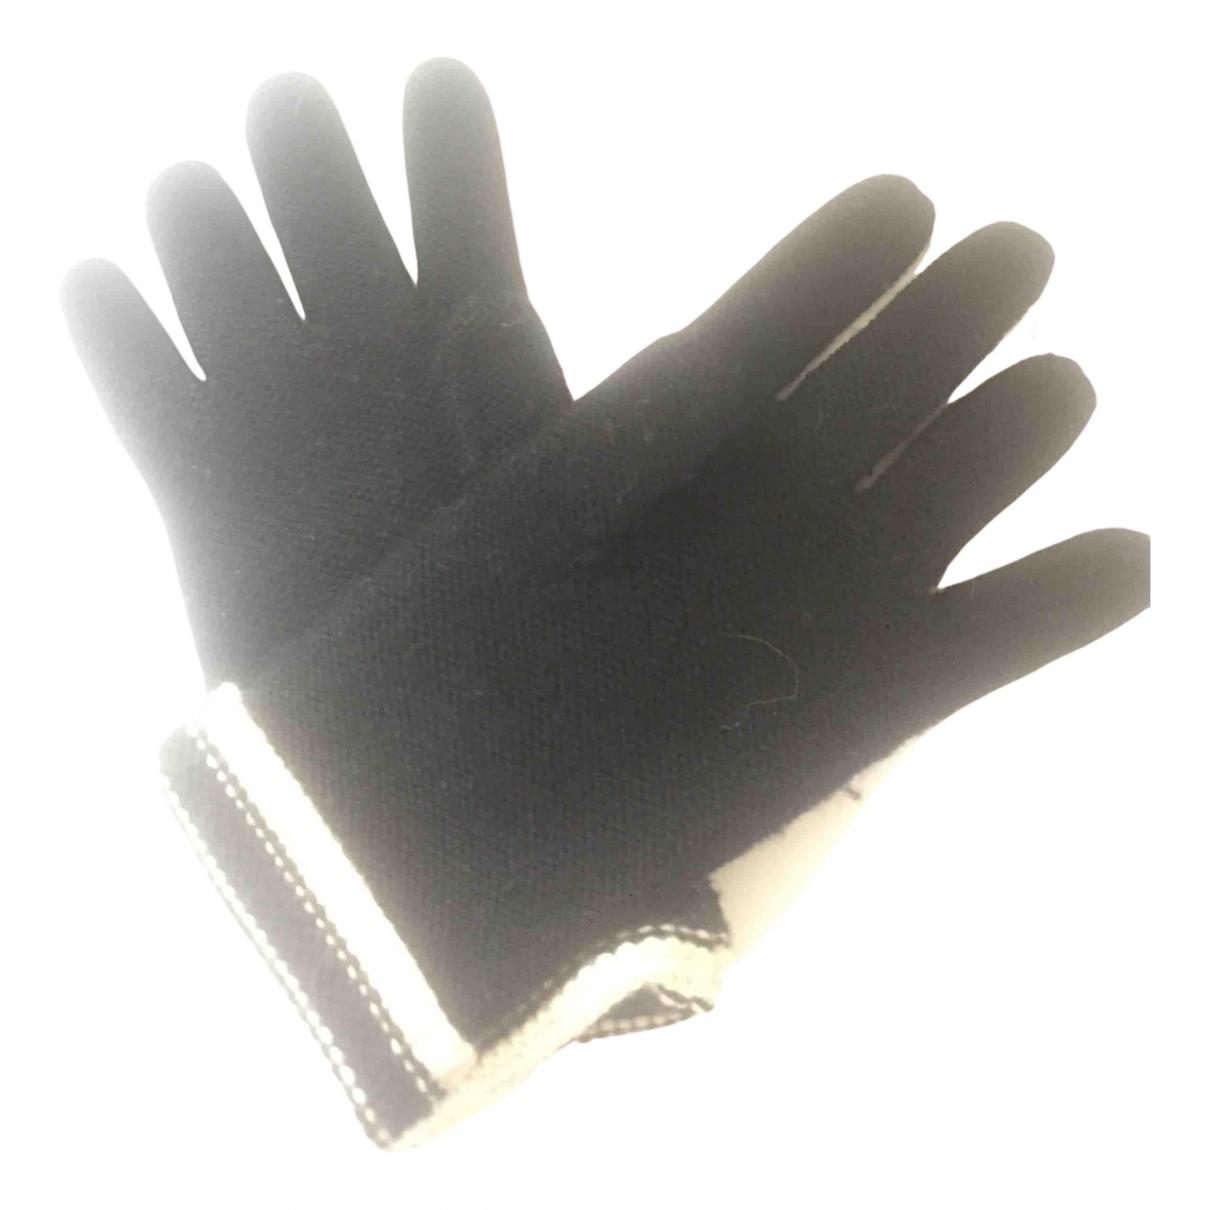 Sonia Rykiel \N Hut, Muetzen, Handschuhe in  Schwarz Wolle